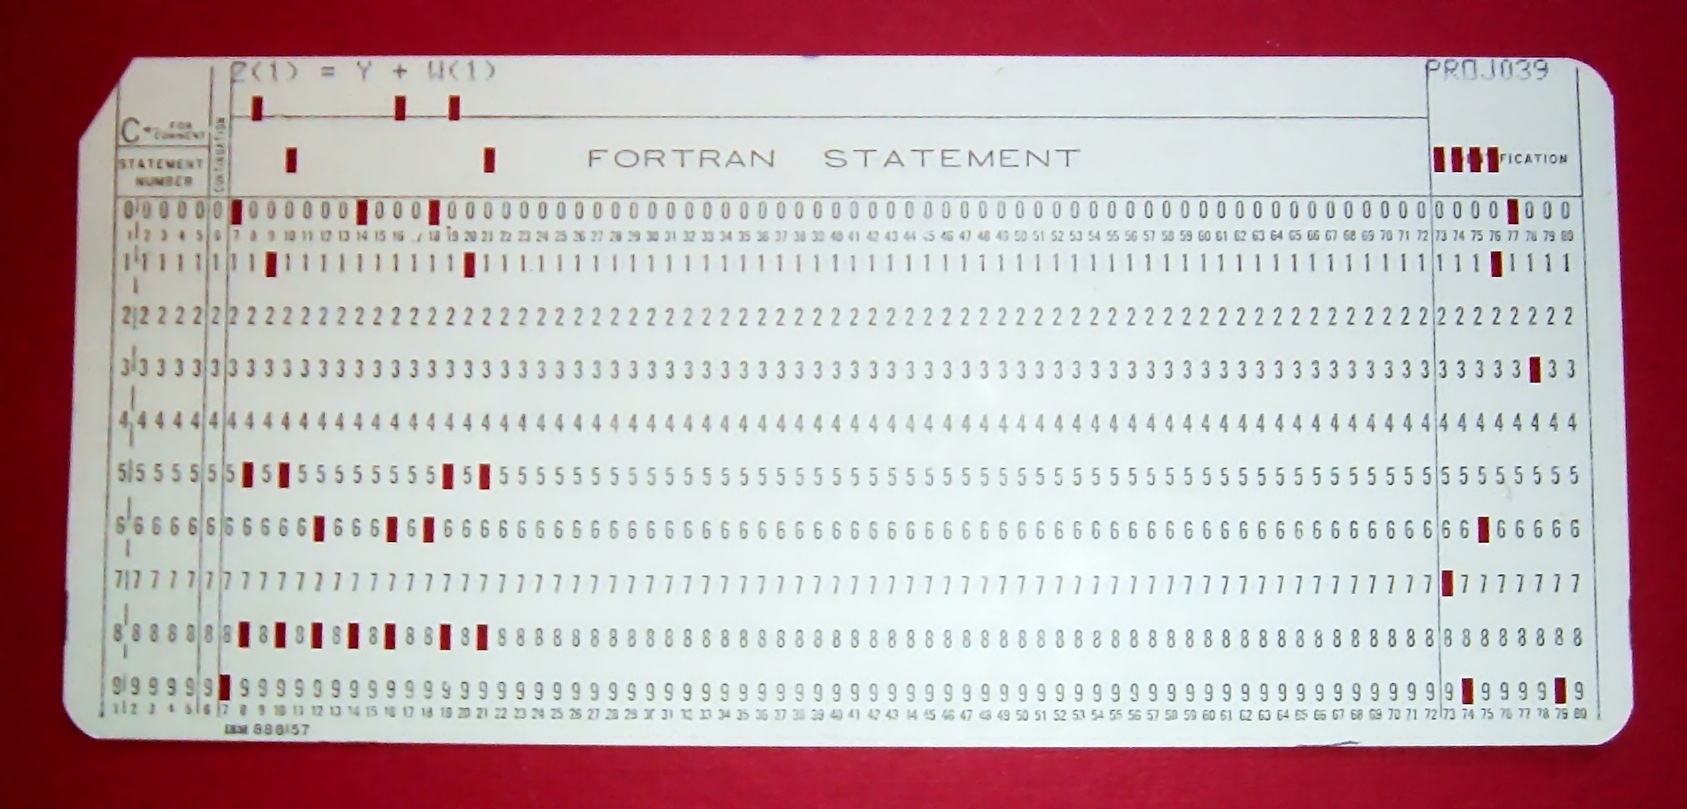 https://en.wikipedia.org/wiki/Computer_programming_in_the_punched_card_era#/media/File:FortranCardPROJ039.agr.jpg